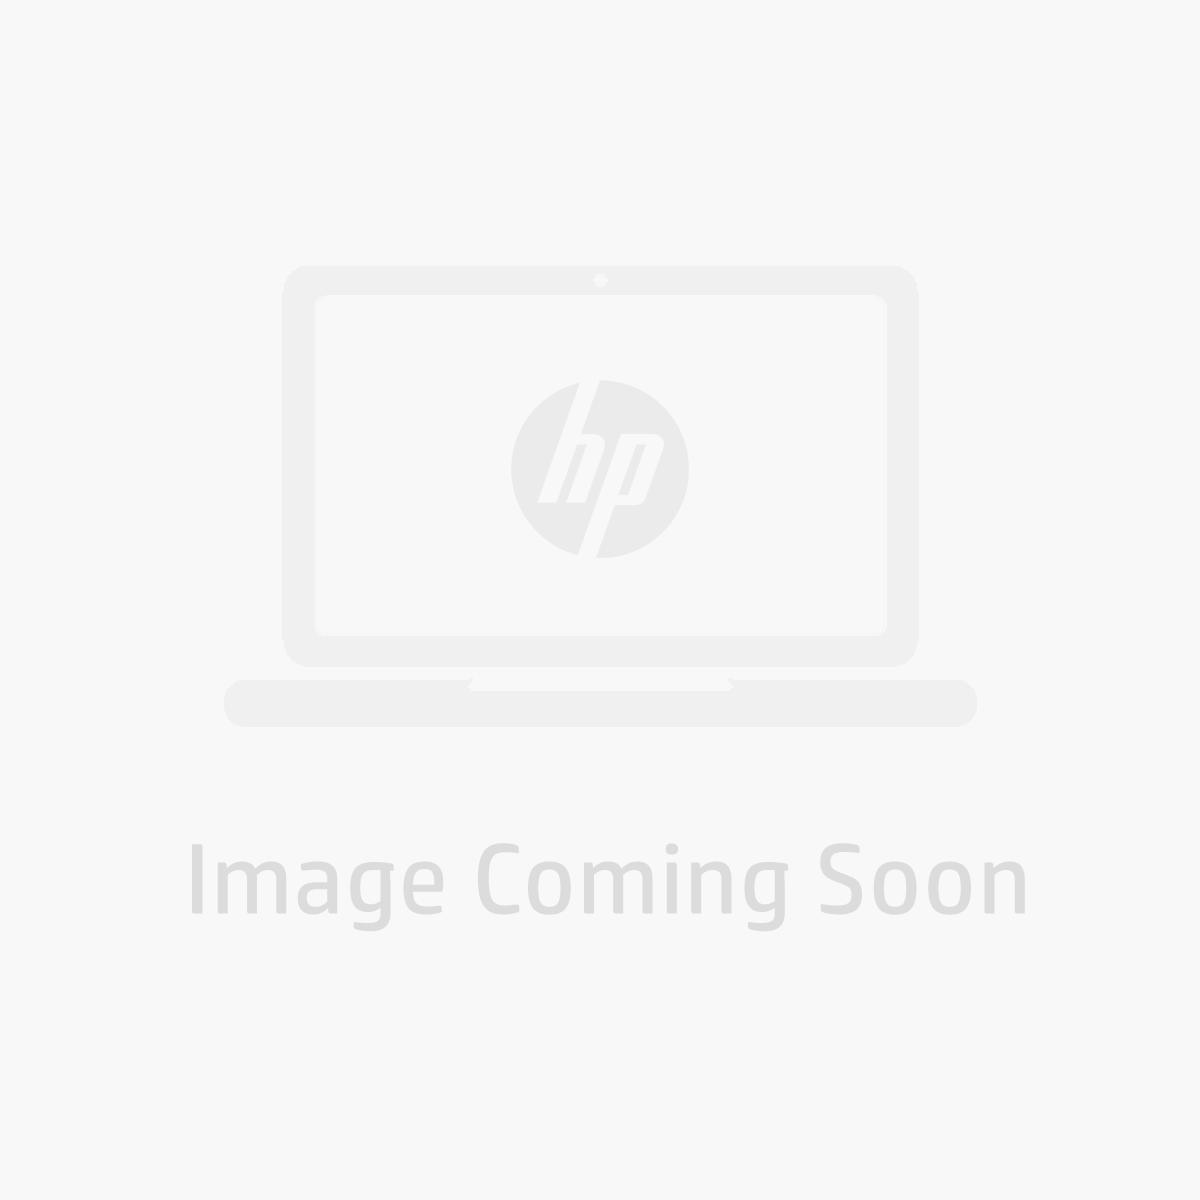 Image of HP HP 131A Yellow Original LaserJet Toner Cartridge